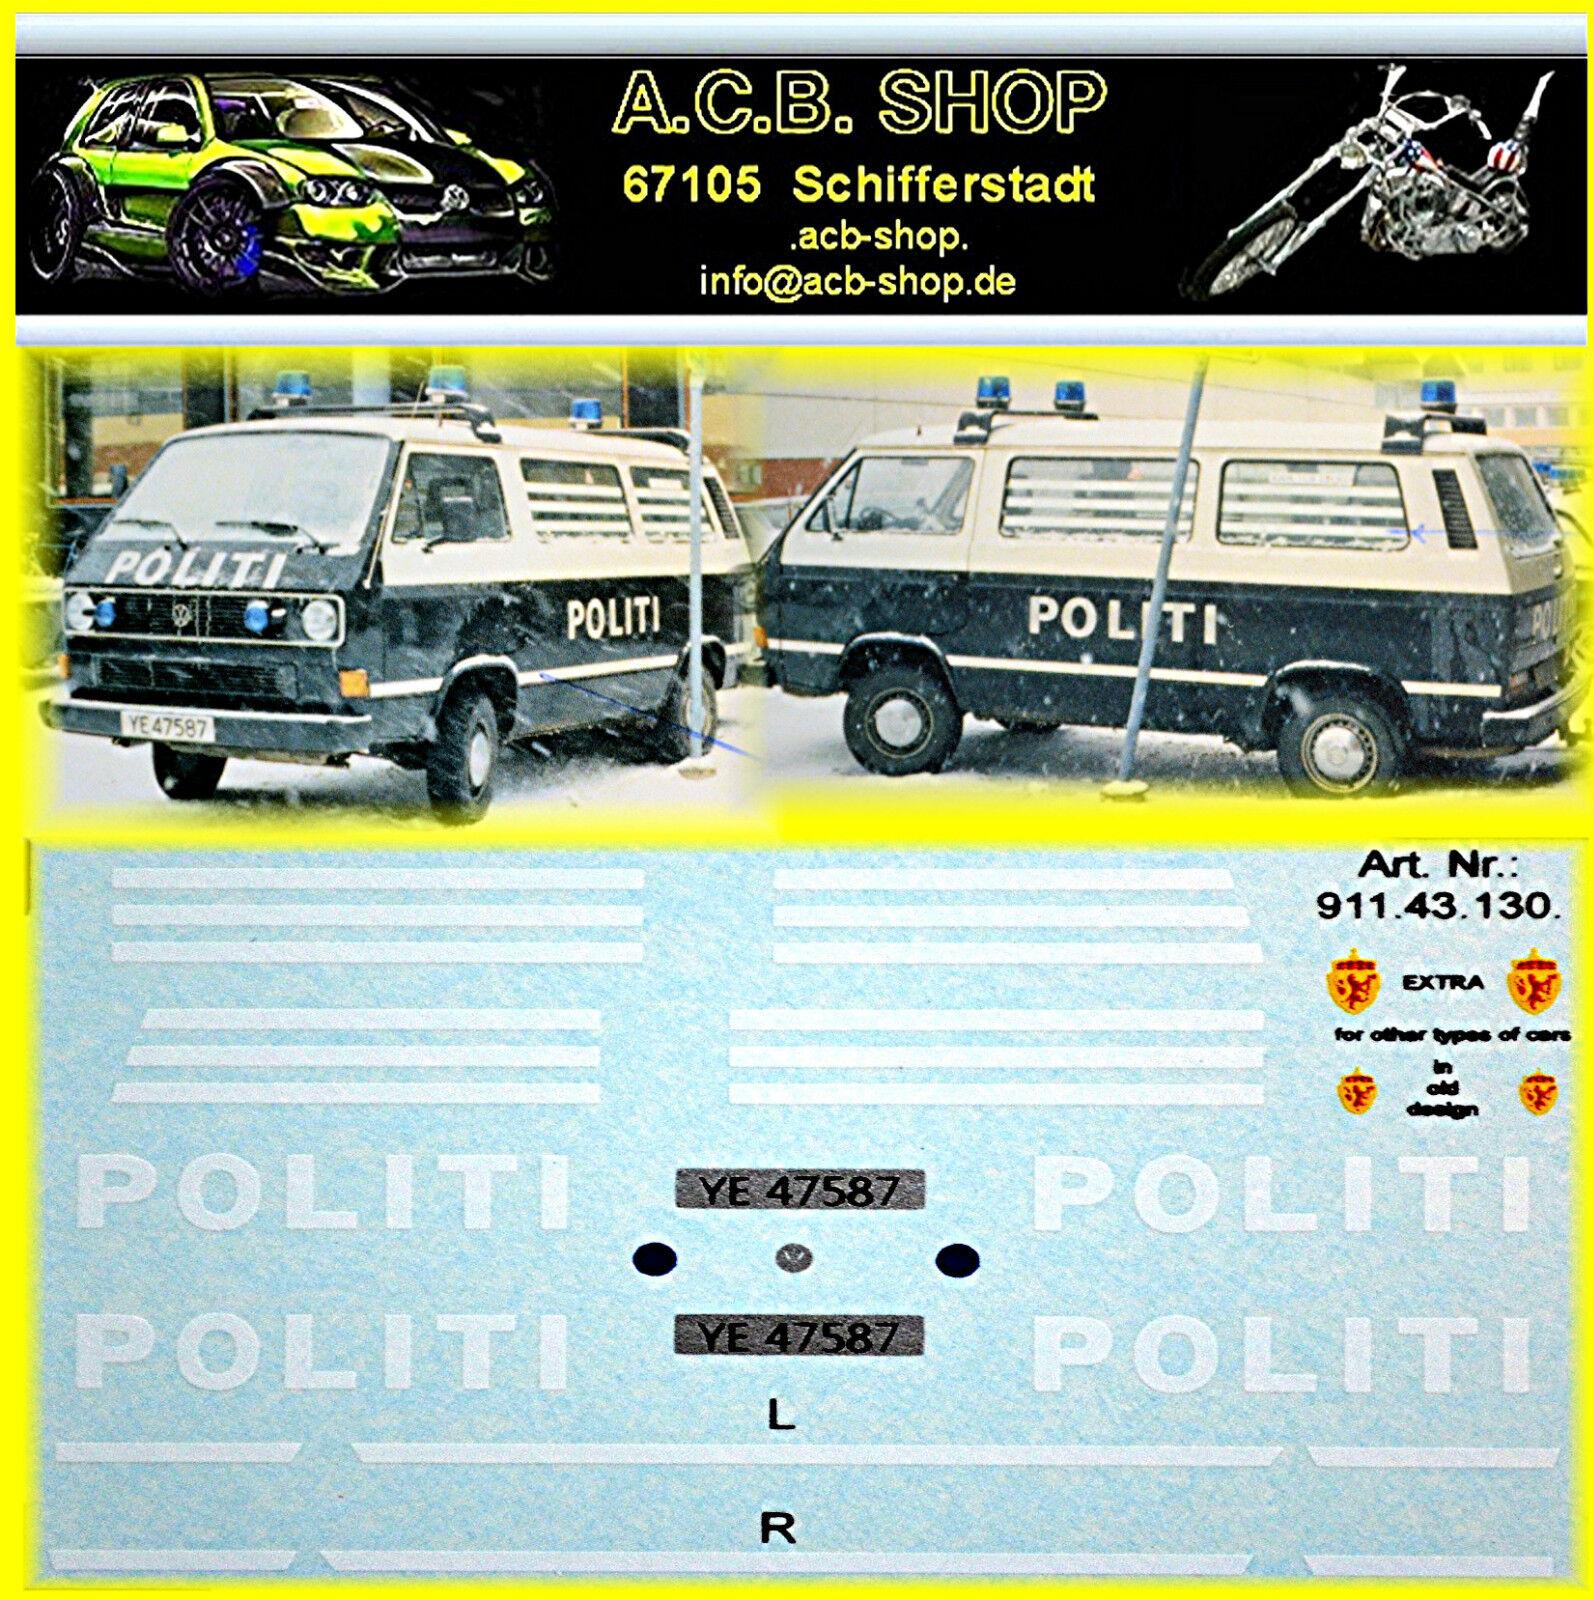 vw t3 politi norway 1990 decal abziebilder 1 87 police cars of the world ebay. Black Bedroom Furniture Sets. Home Design Ideas